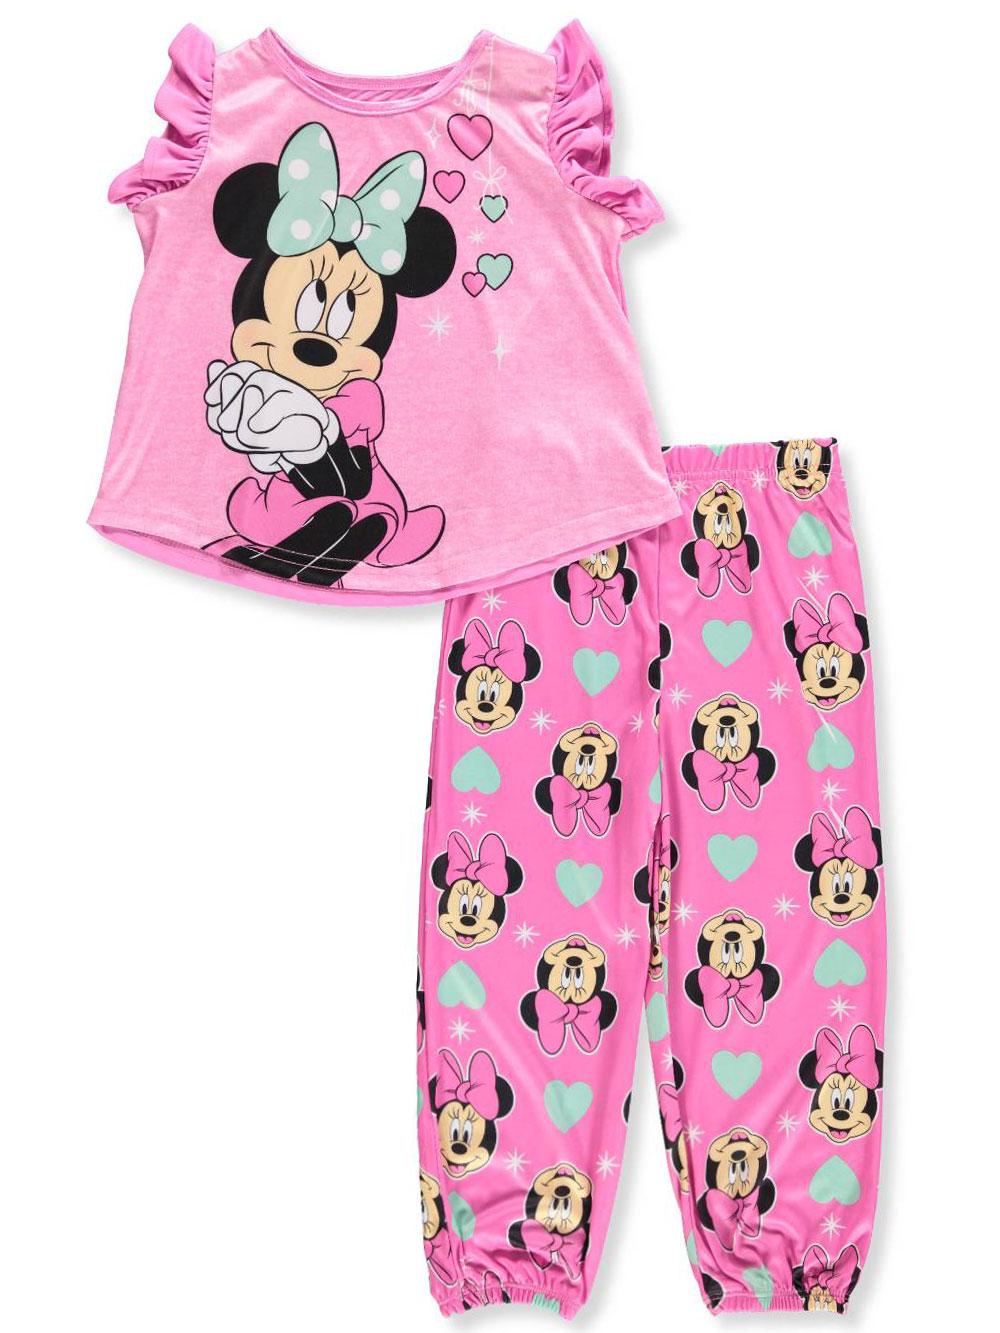 012a19a4c Disney Minnie Mouse Girls  2-Piece Pajamas